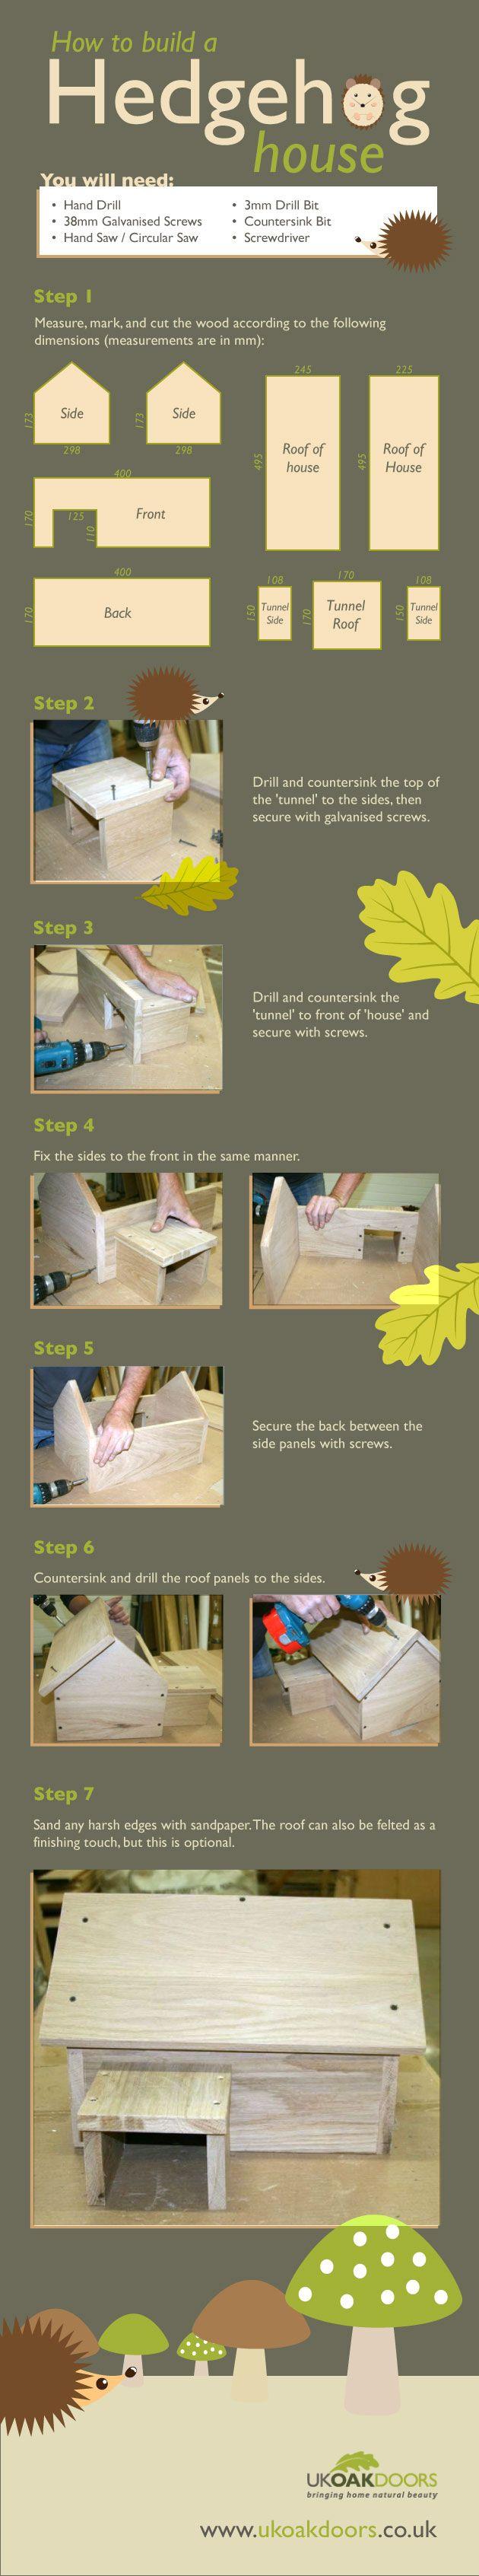 How to Build a Wood Hedgehog House | DIY for Life